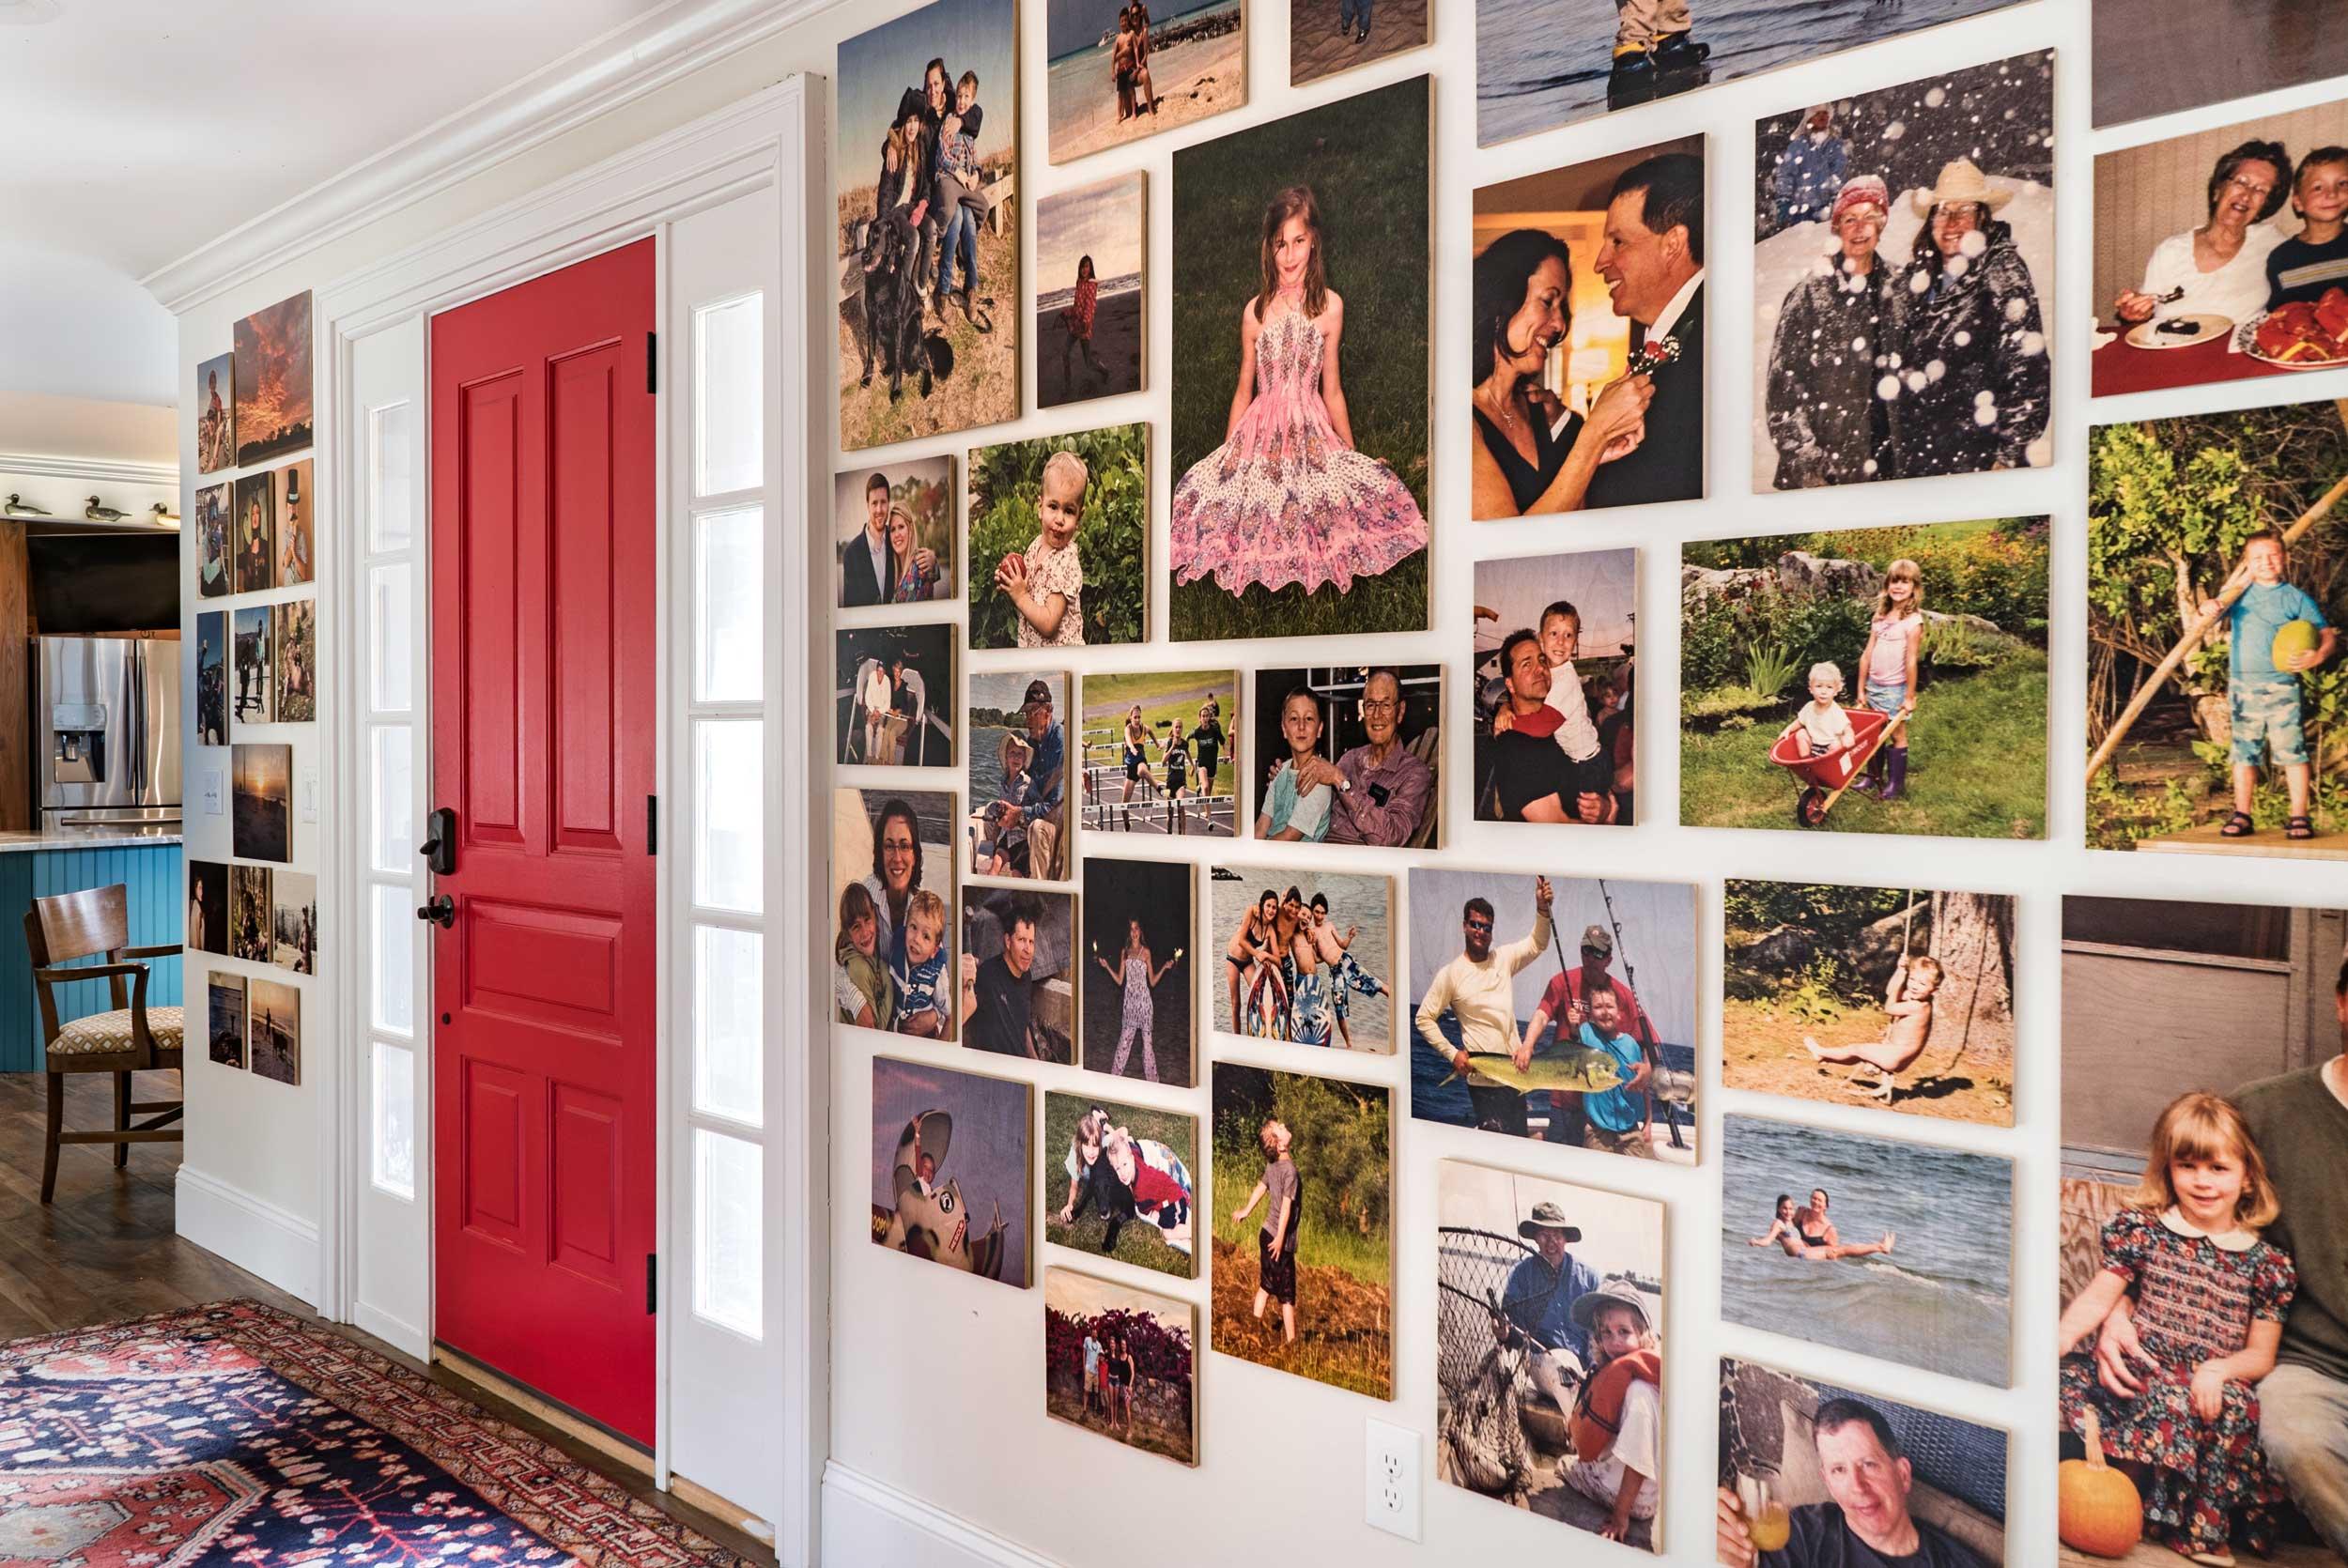 Goodlife-Wall-Art-Hallway-Post-Production.jpg